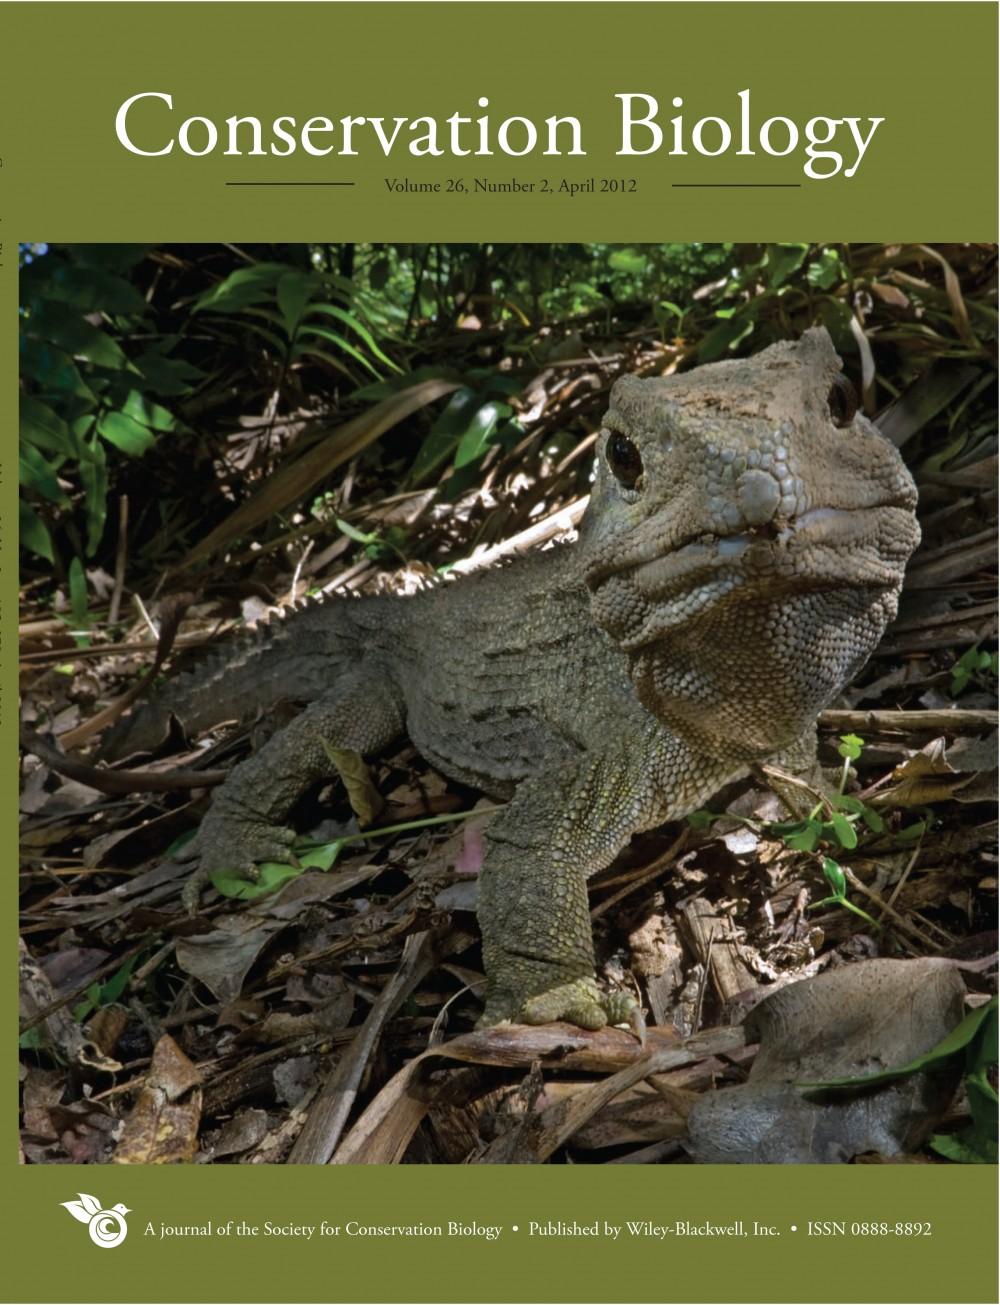 Conservation biology term paper